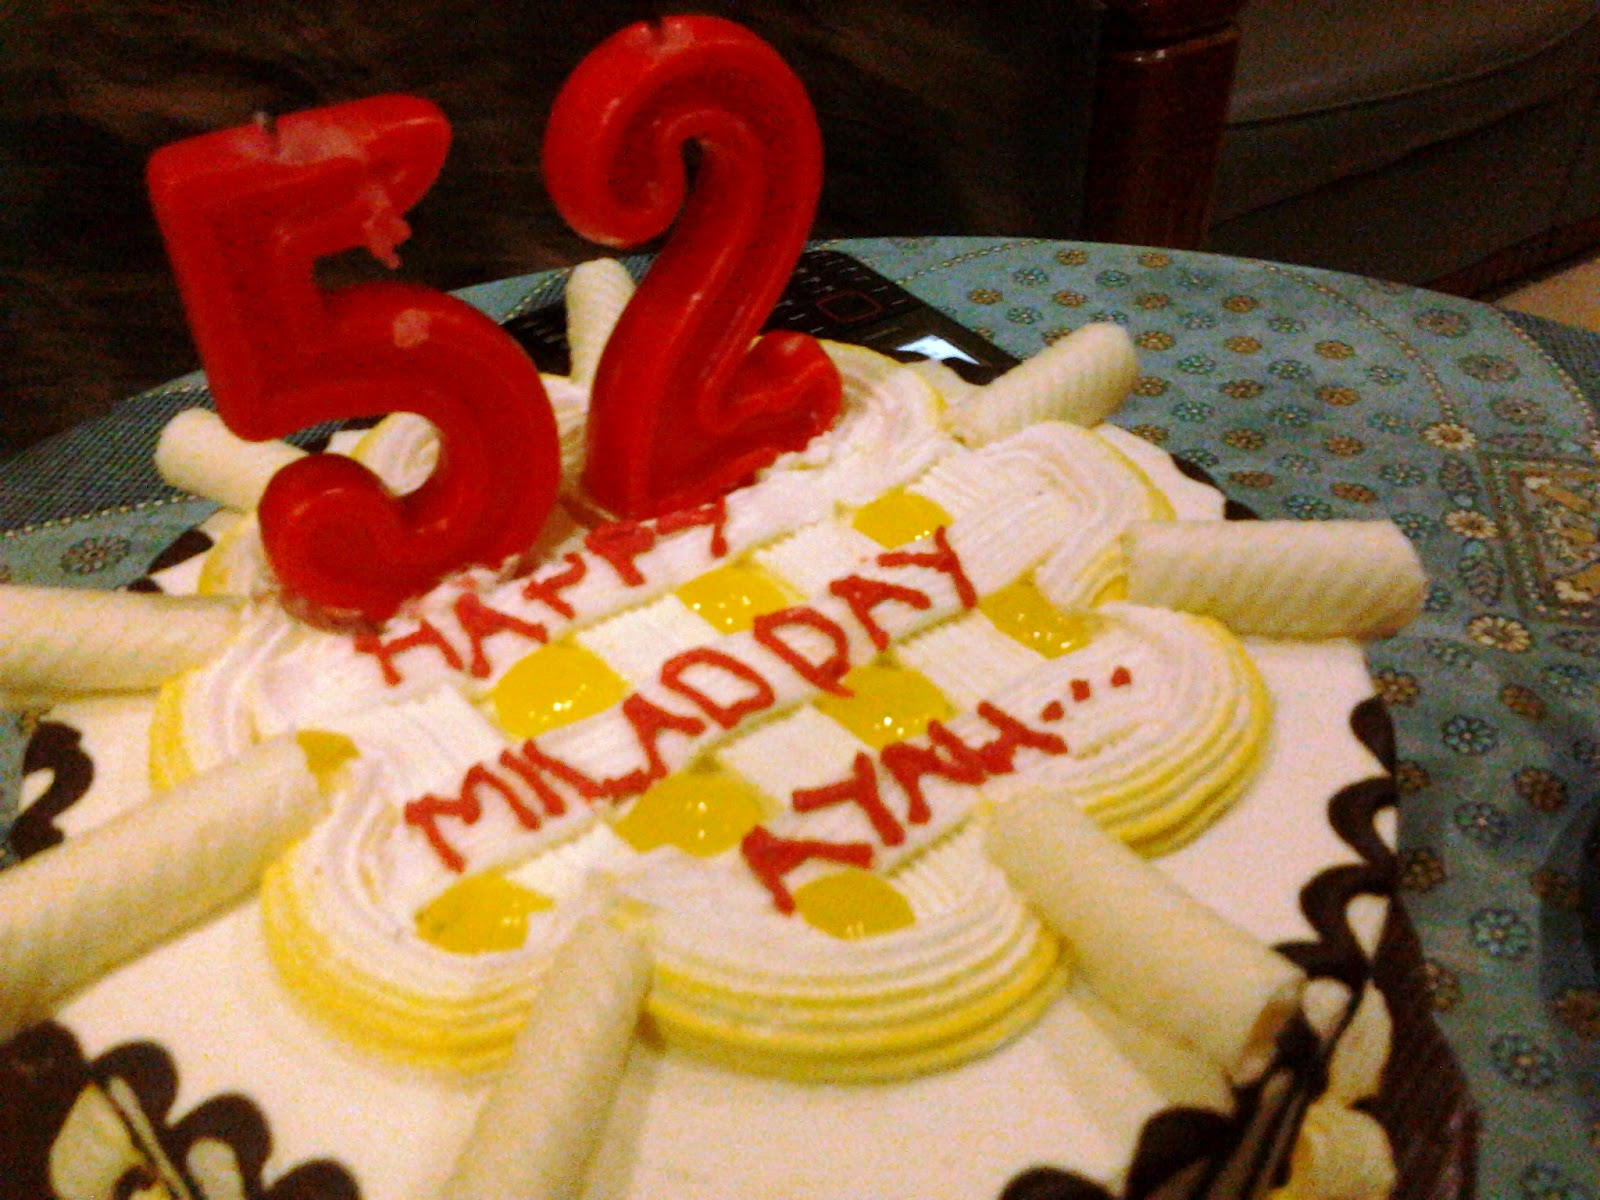 PANGGUNG SANDIWARA: ayah selamat ulang tahun.